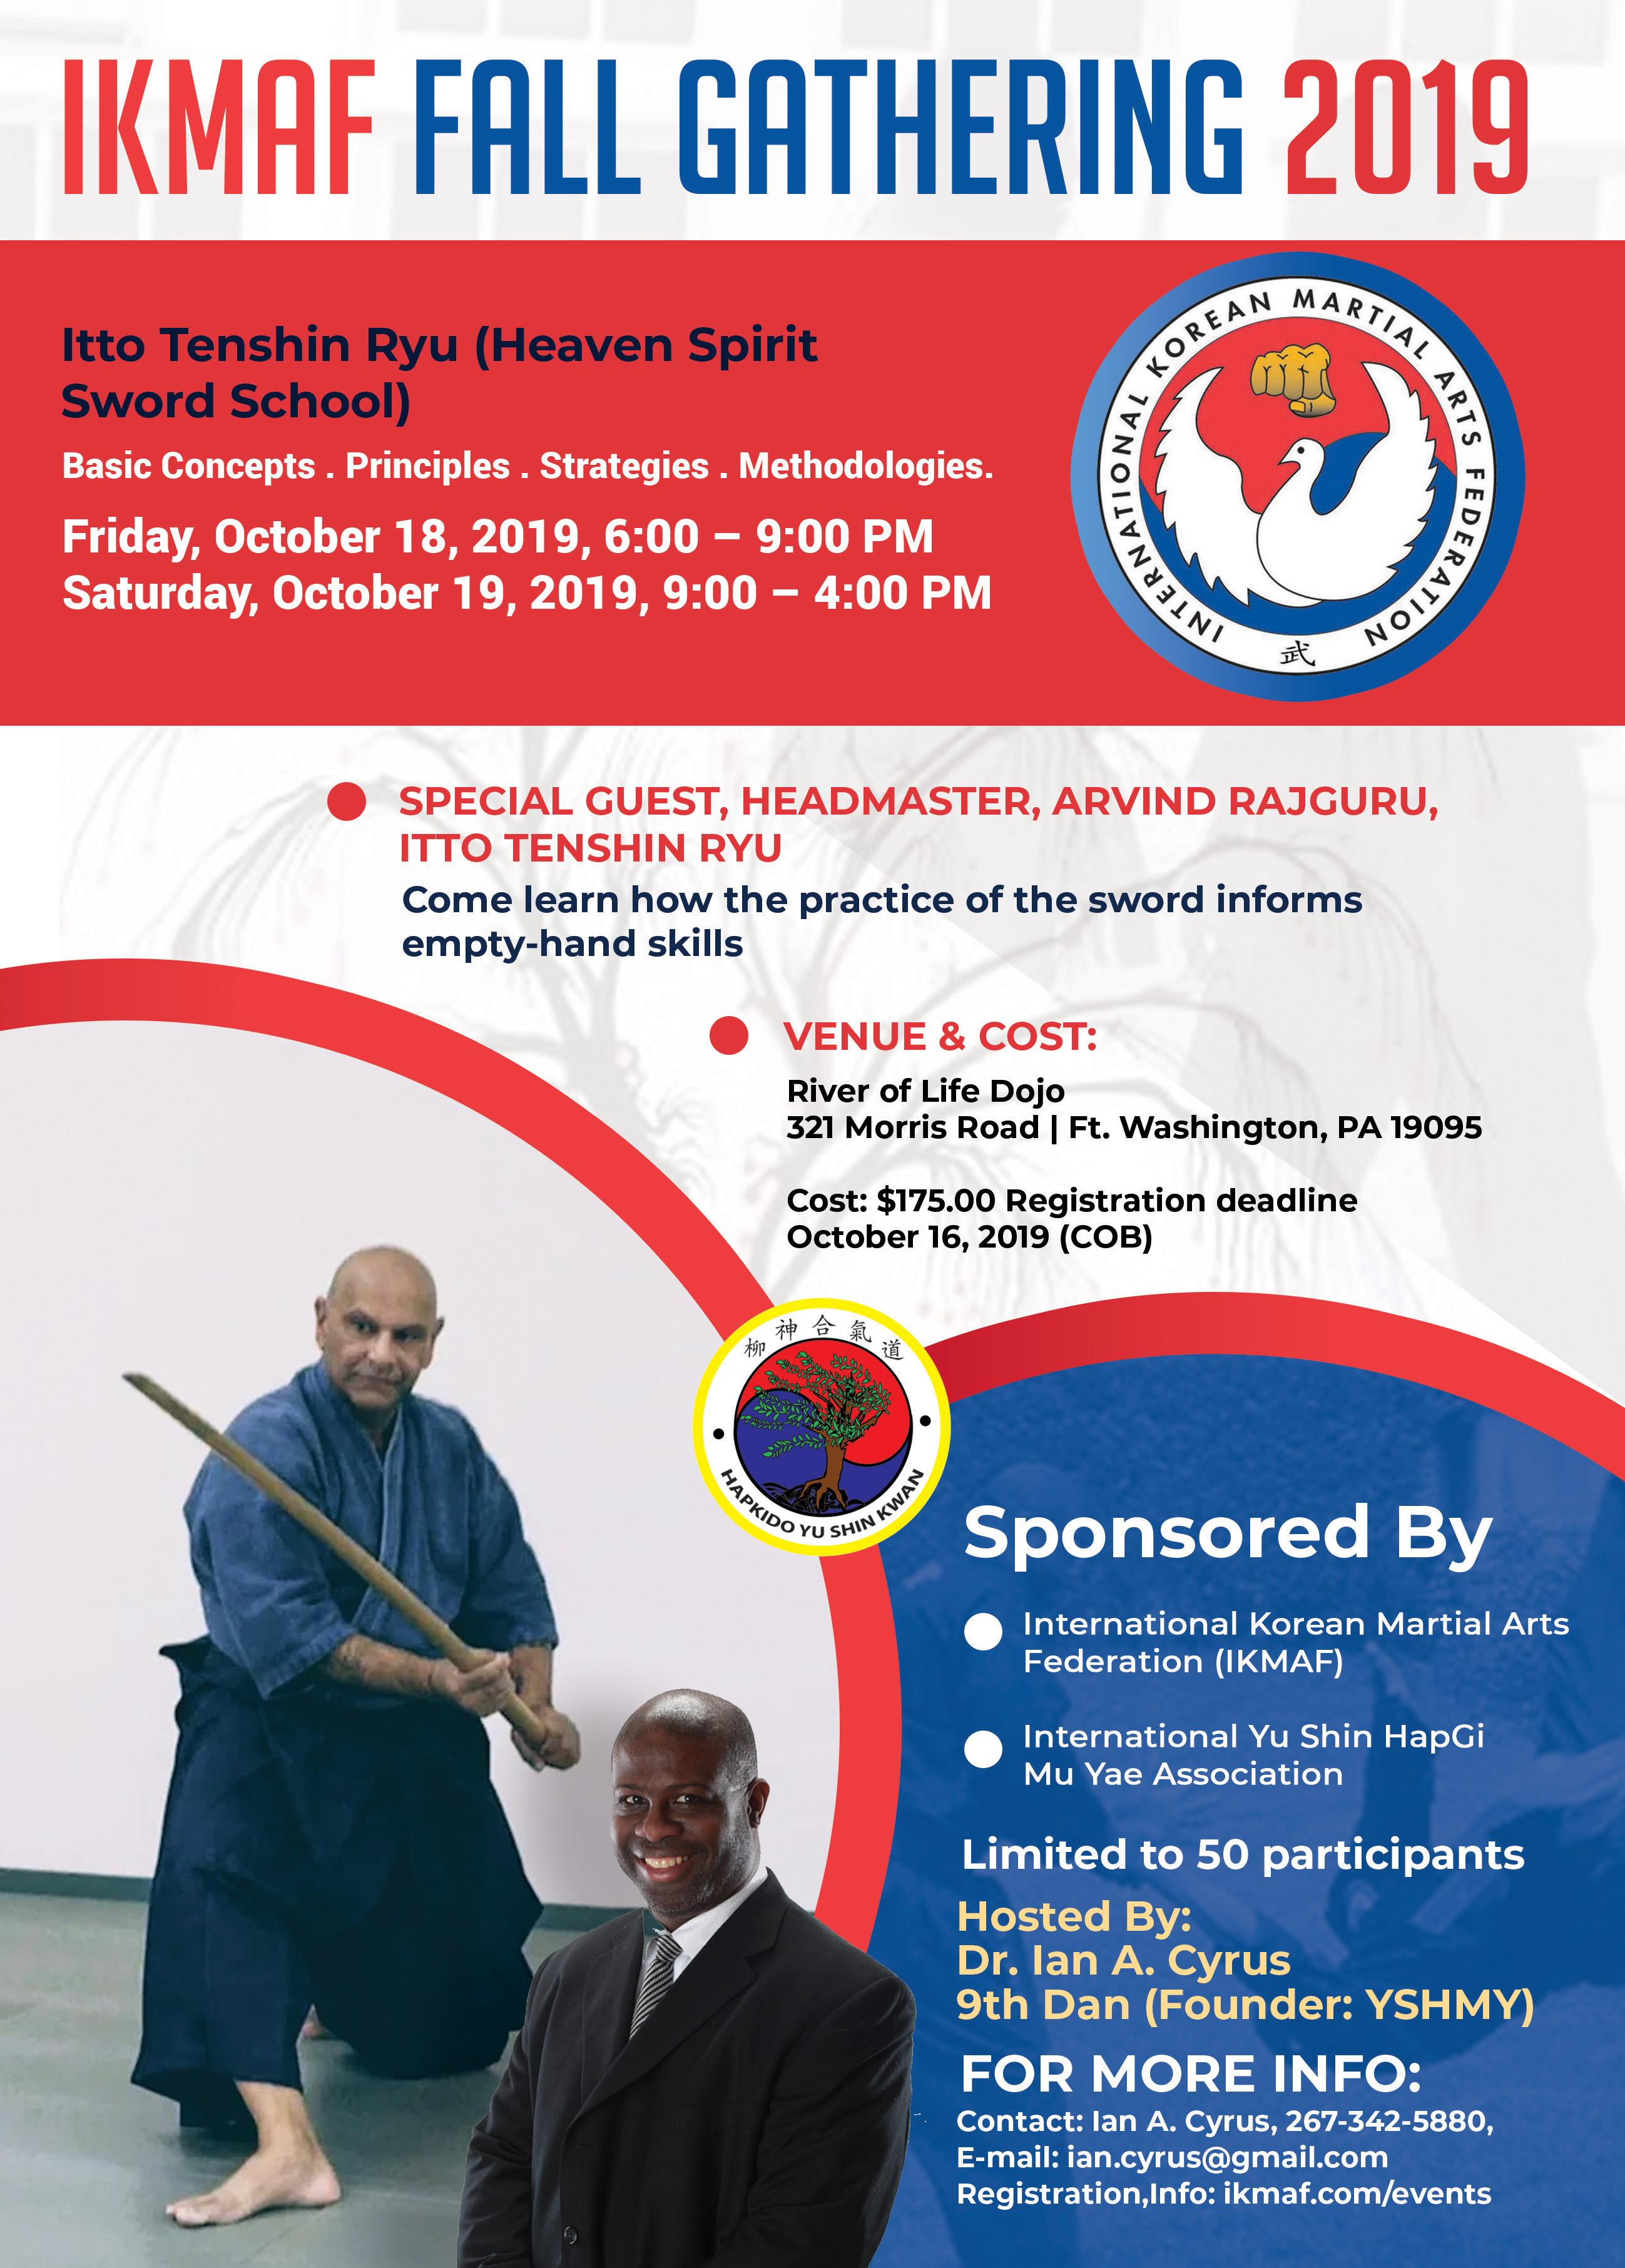 International Korean Martial Arts Federation - IKMAF 2019 Fall Gathering